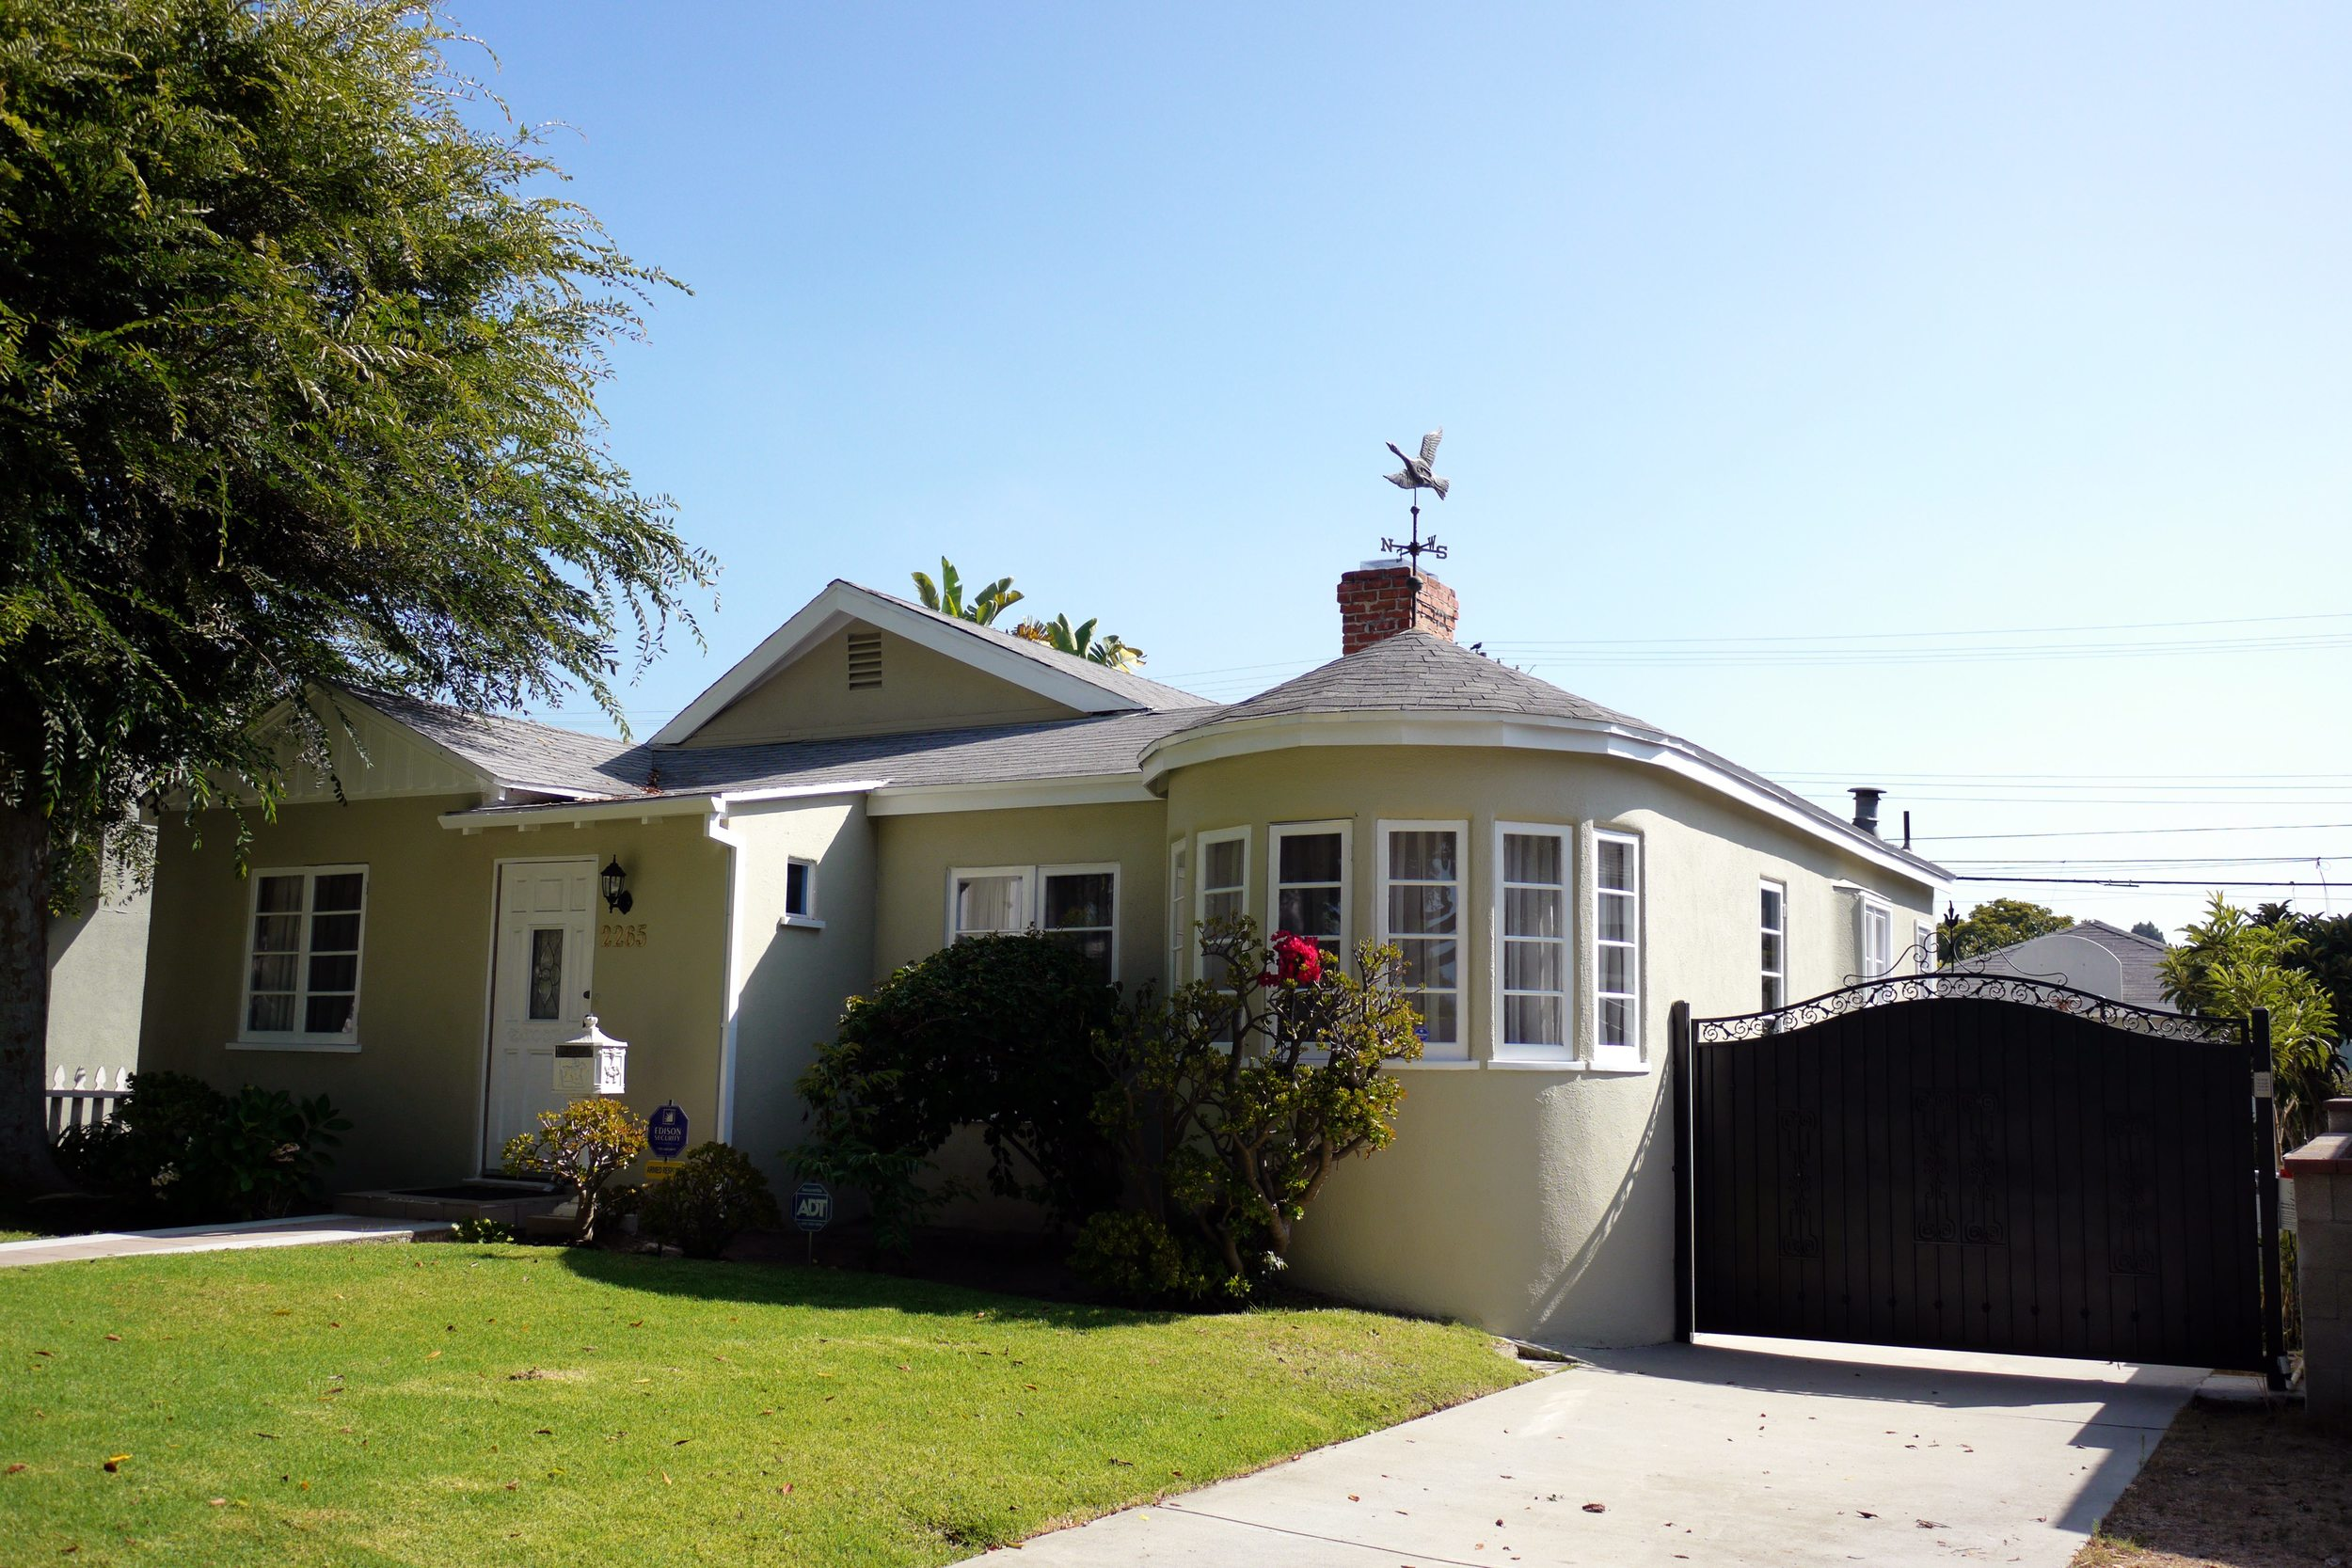 2265 Cloverfield Blvd, Santa Monica 90405